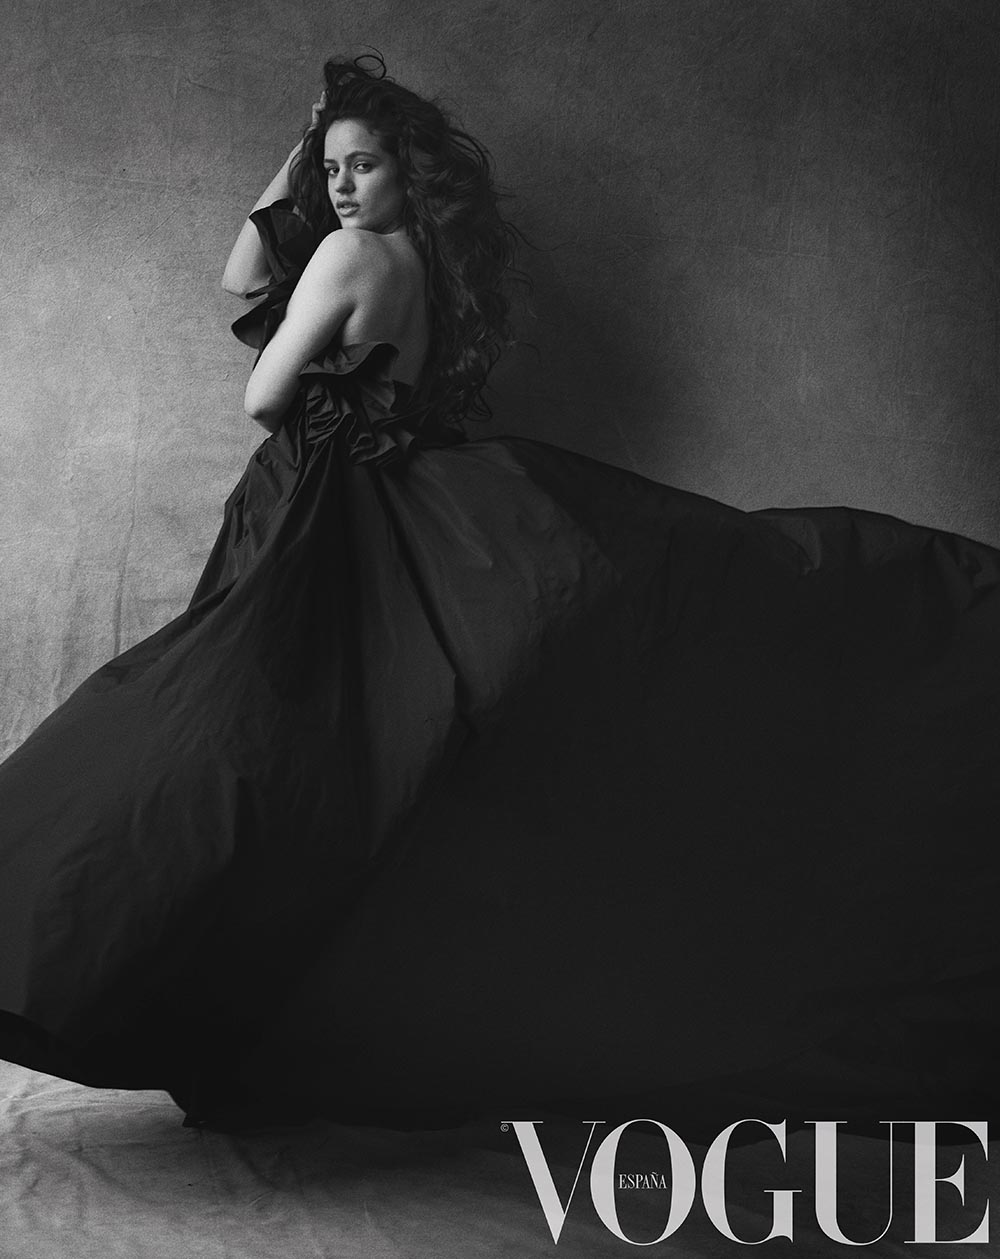 Vogue julio_Rosalía por Peter Lindbergh_vestido de The 2nd Skin Co